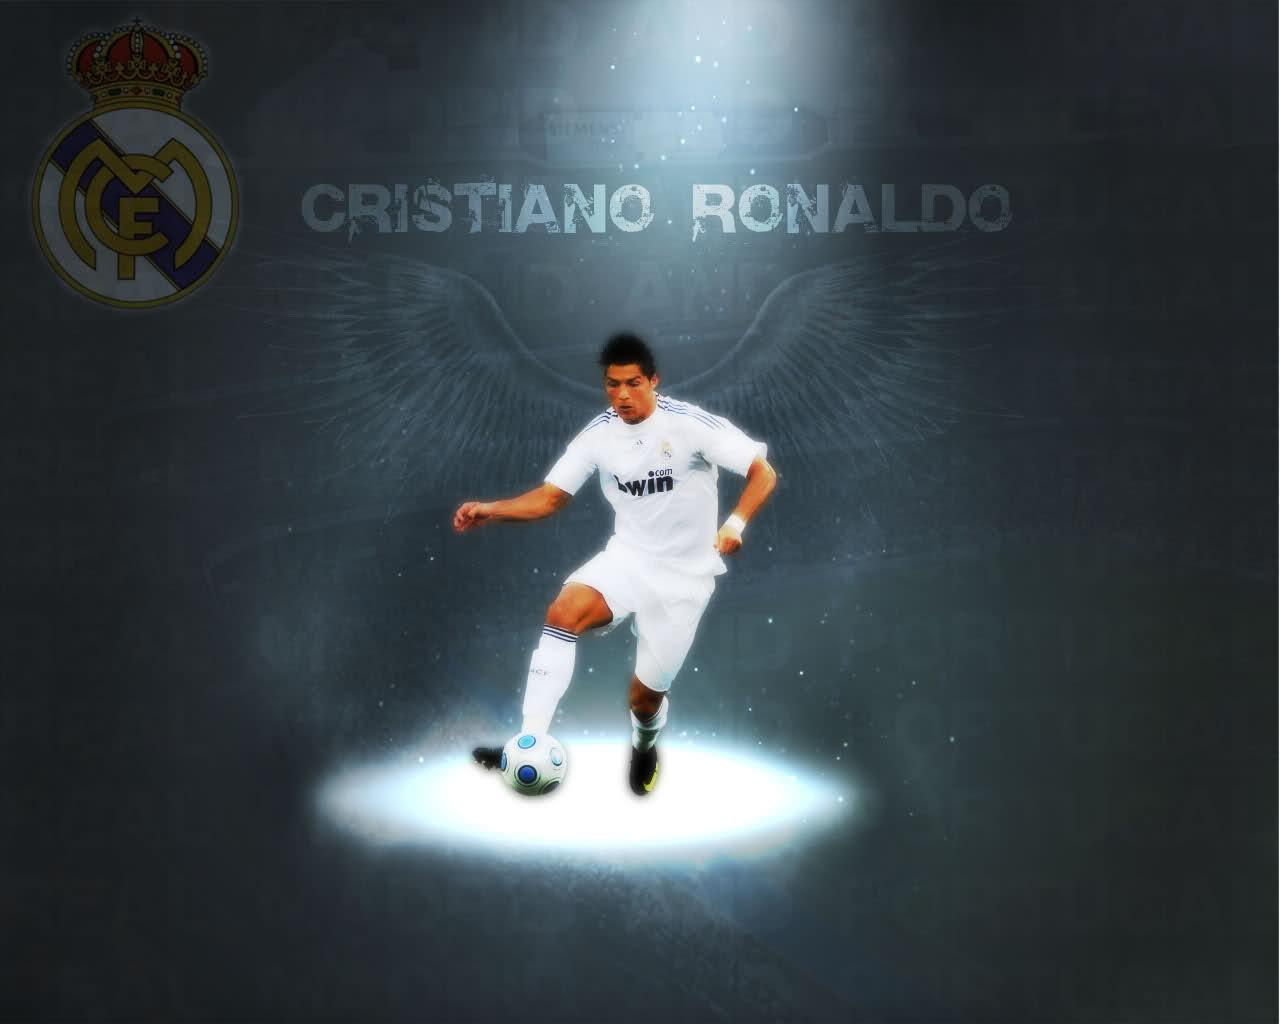 http://3.bp.blogspot.com/-n71SCo5fEio/TrnFCJnwYzI/AAAAAAAAAgo/uri8HSKrIHE/s1600/c.ronaldo+real+madrid+2012.jpg